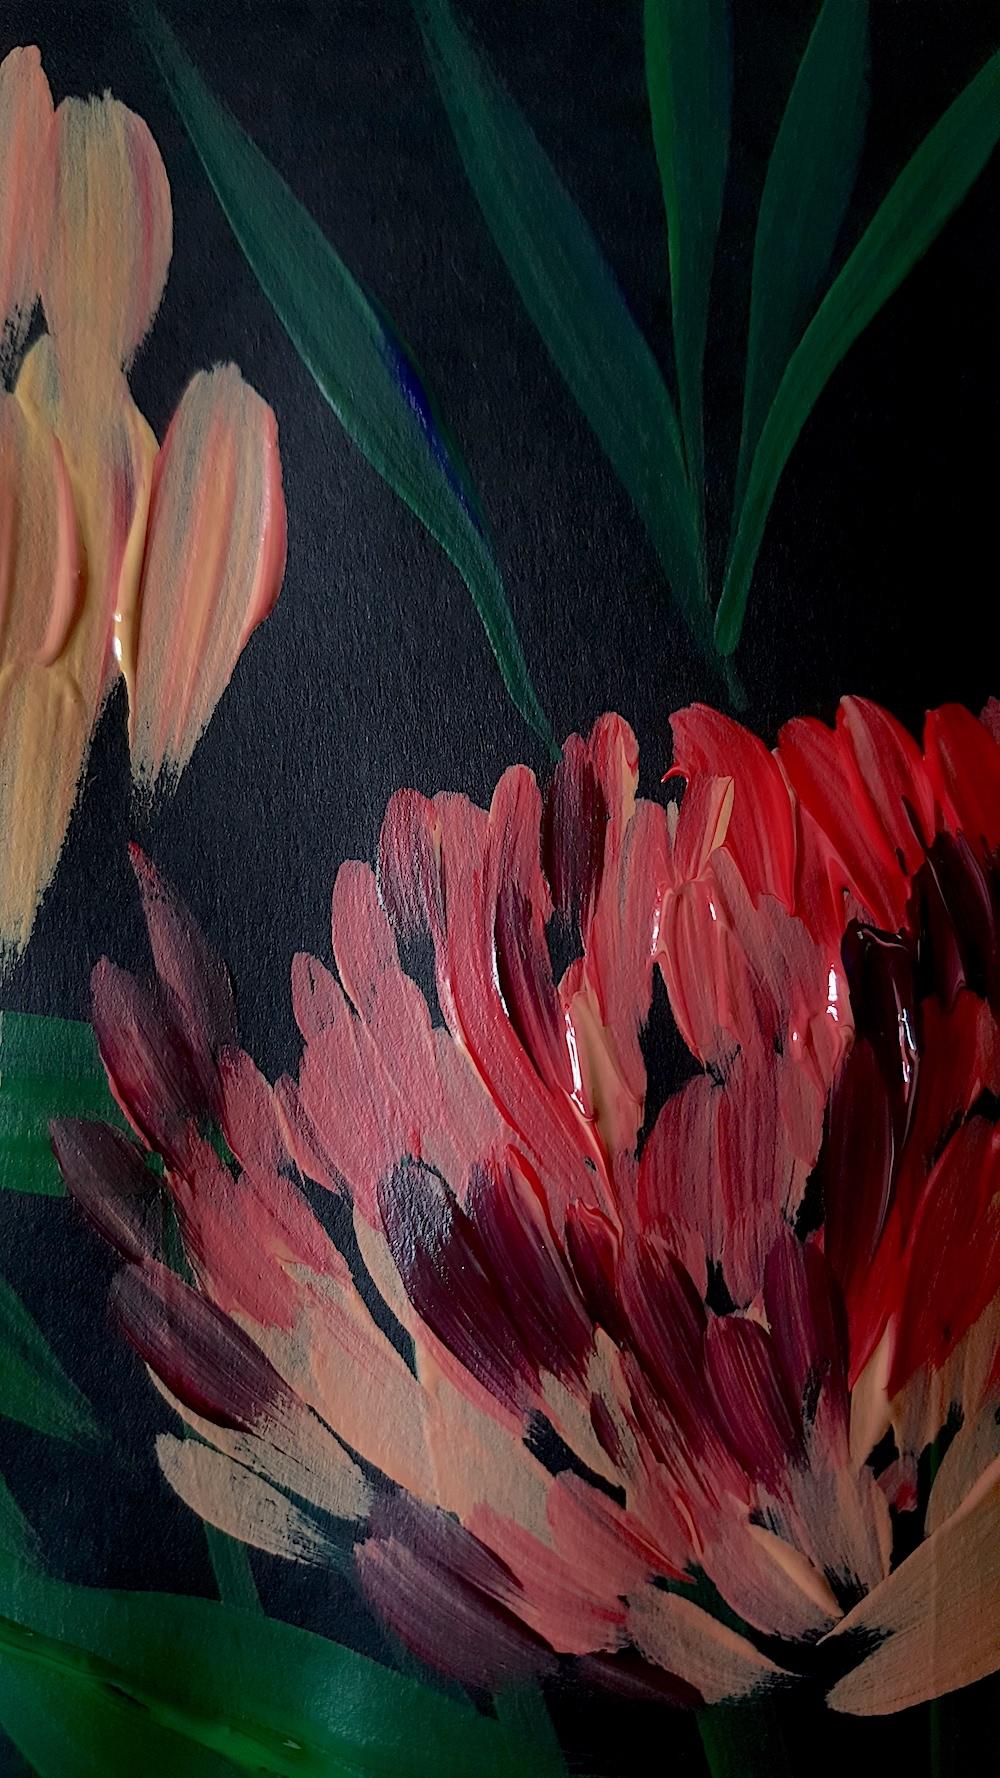 Acrylic Paintings Illustrator inspired by Burne Jones close up